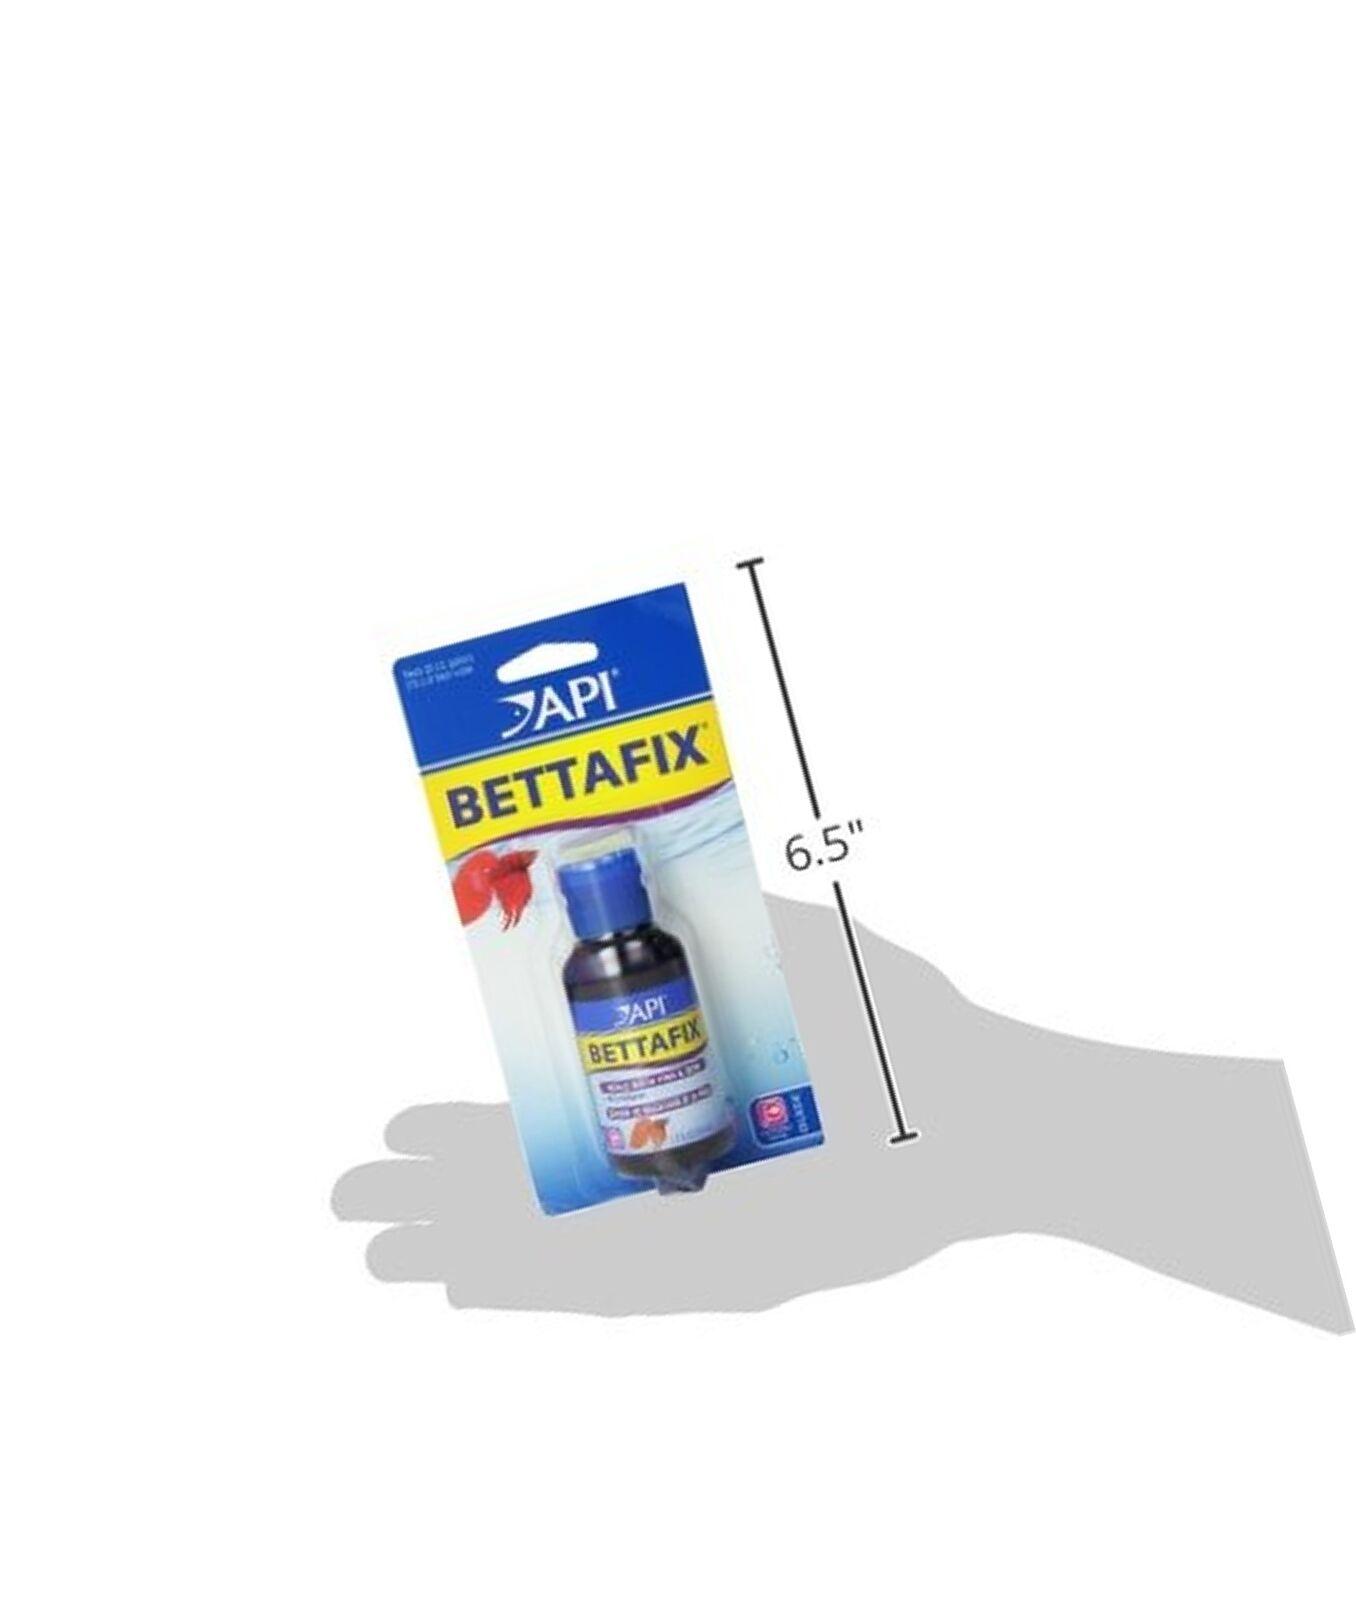 Mars Fishcare Bettafix Remedy 1 25 Ounces - 93b